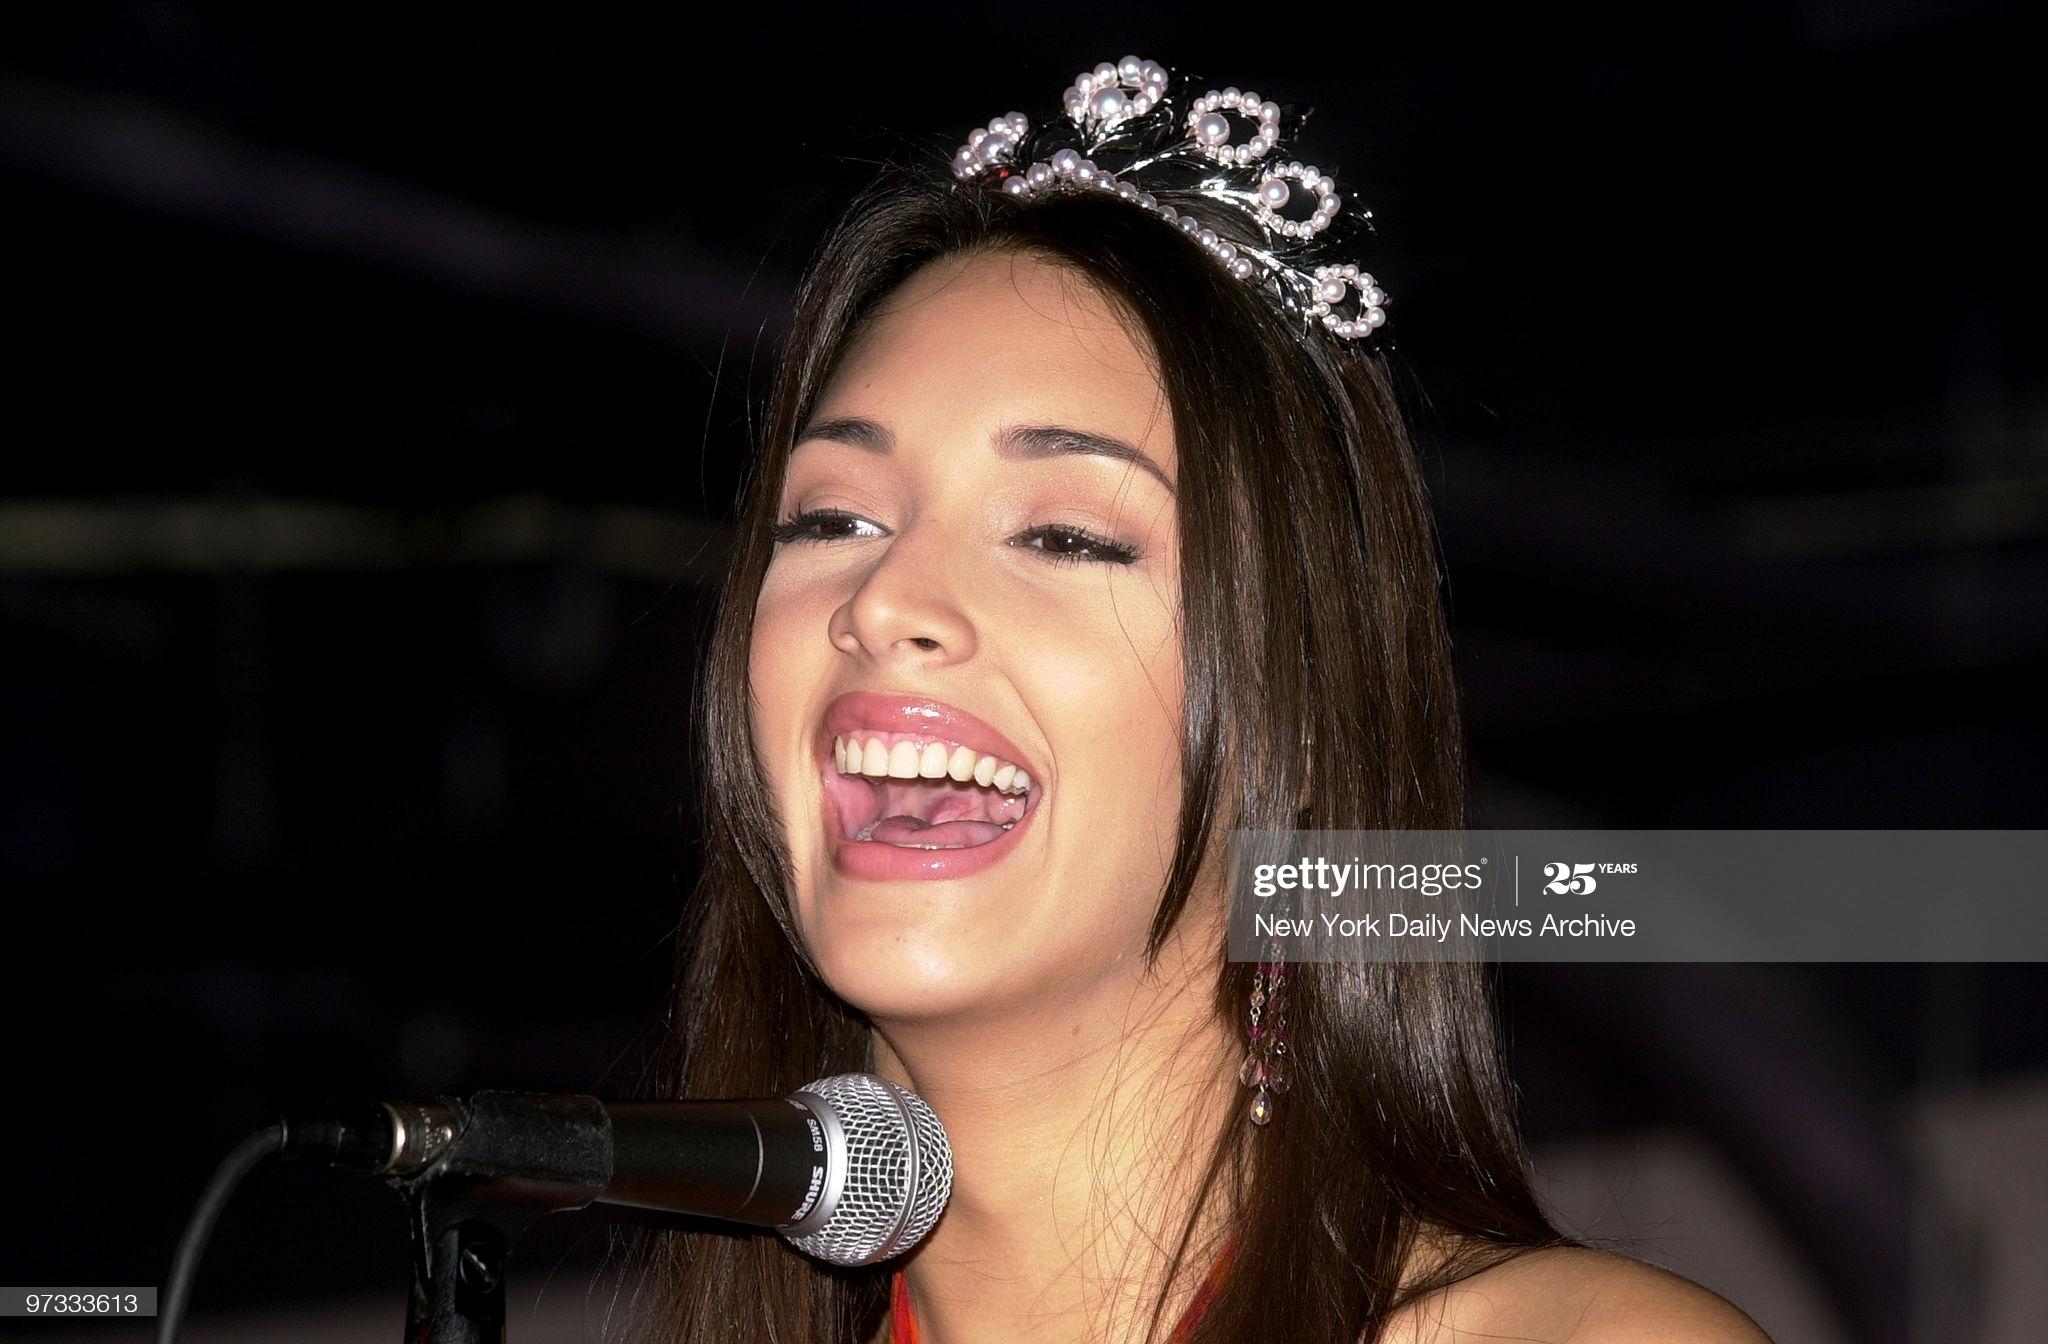 ════ ∘◦❁◦∘ ════ Amelia Vega, Miss Universe 2003. ════ ∘◦❁◦∘ ════ - Página 14 Miss-u62